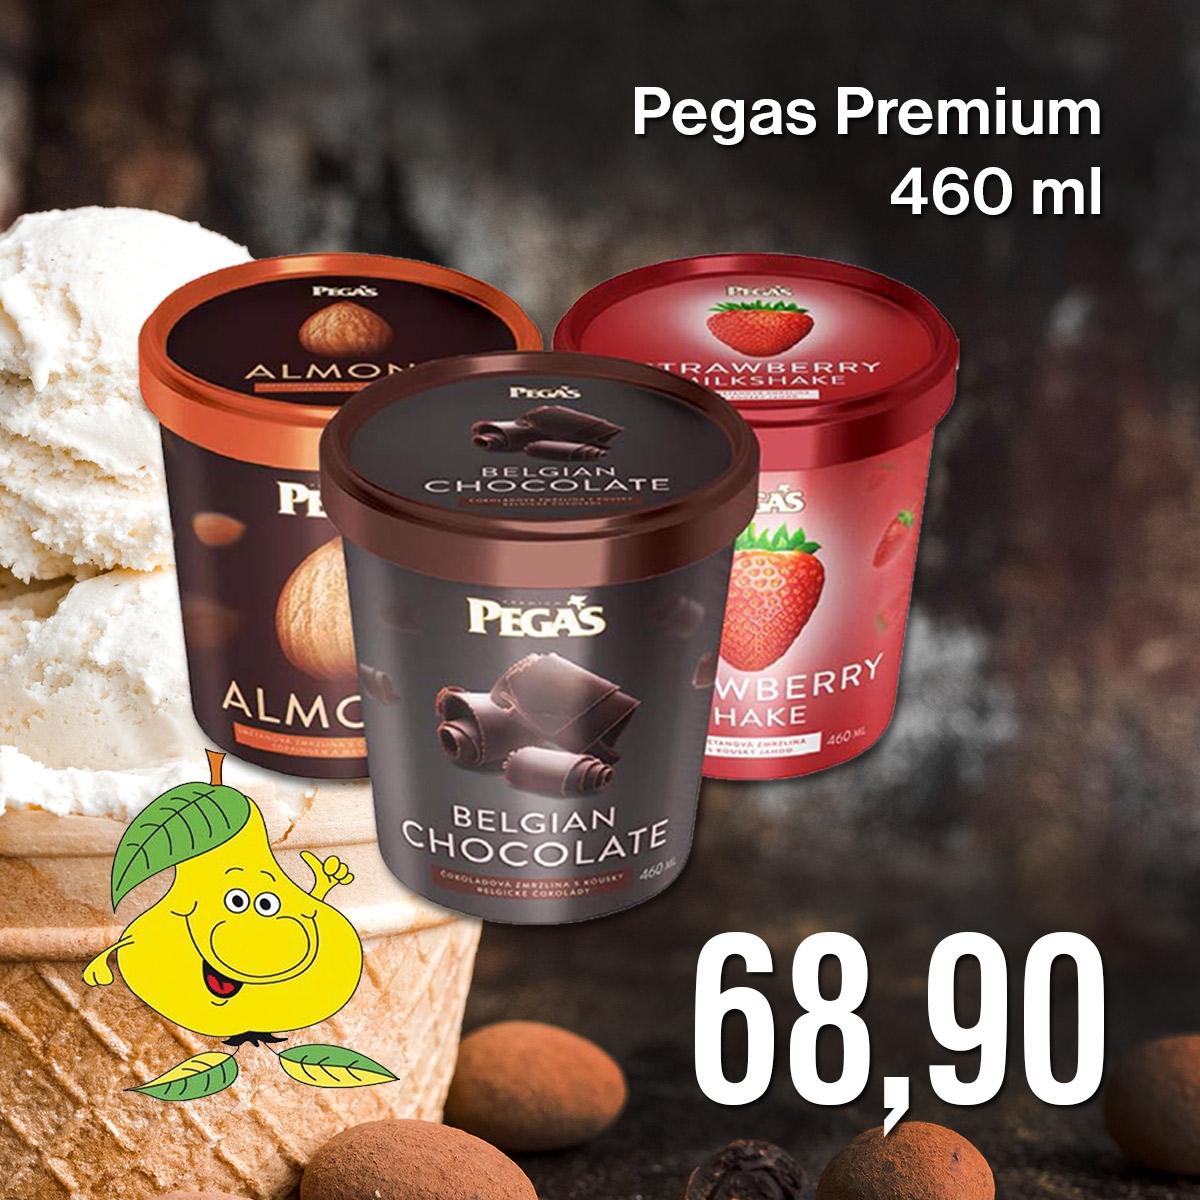 Pegas Premium 460 ml